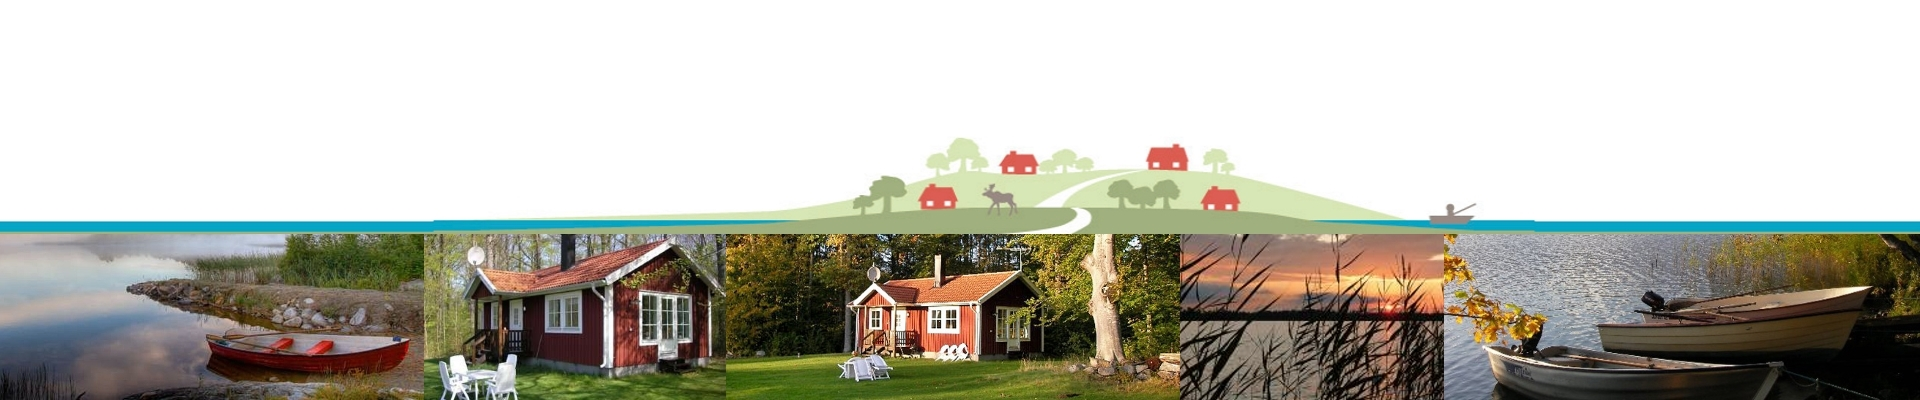 Bosgård cabin rental